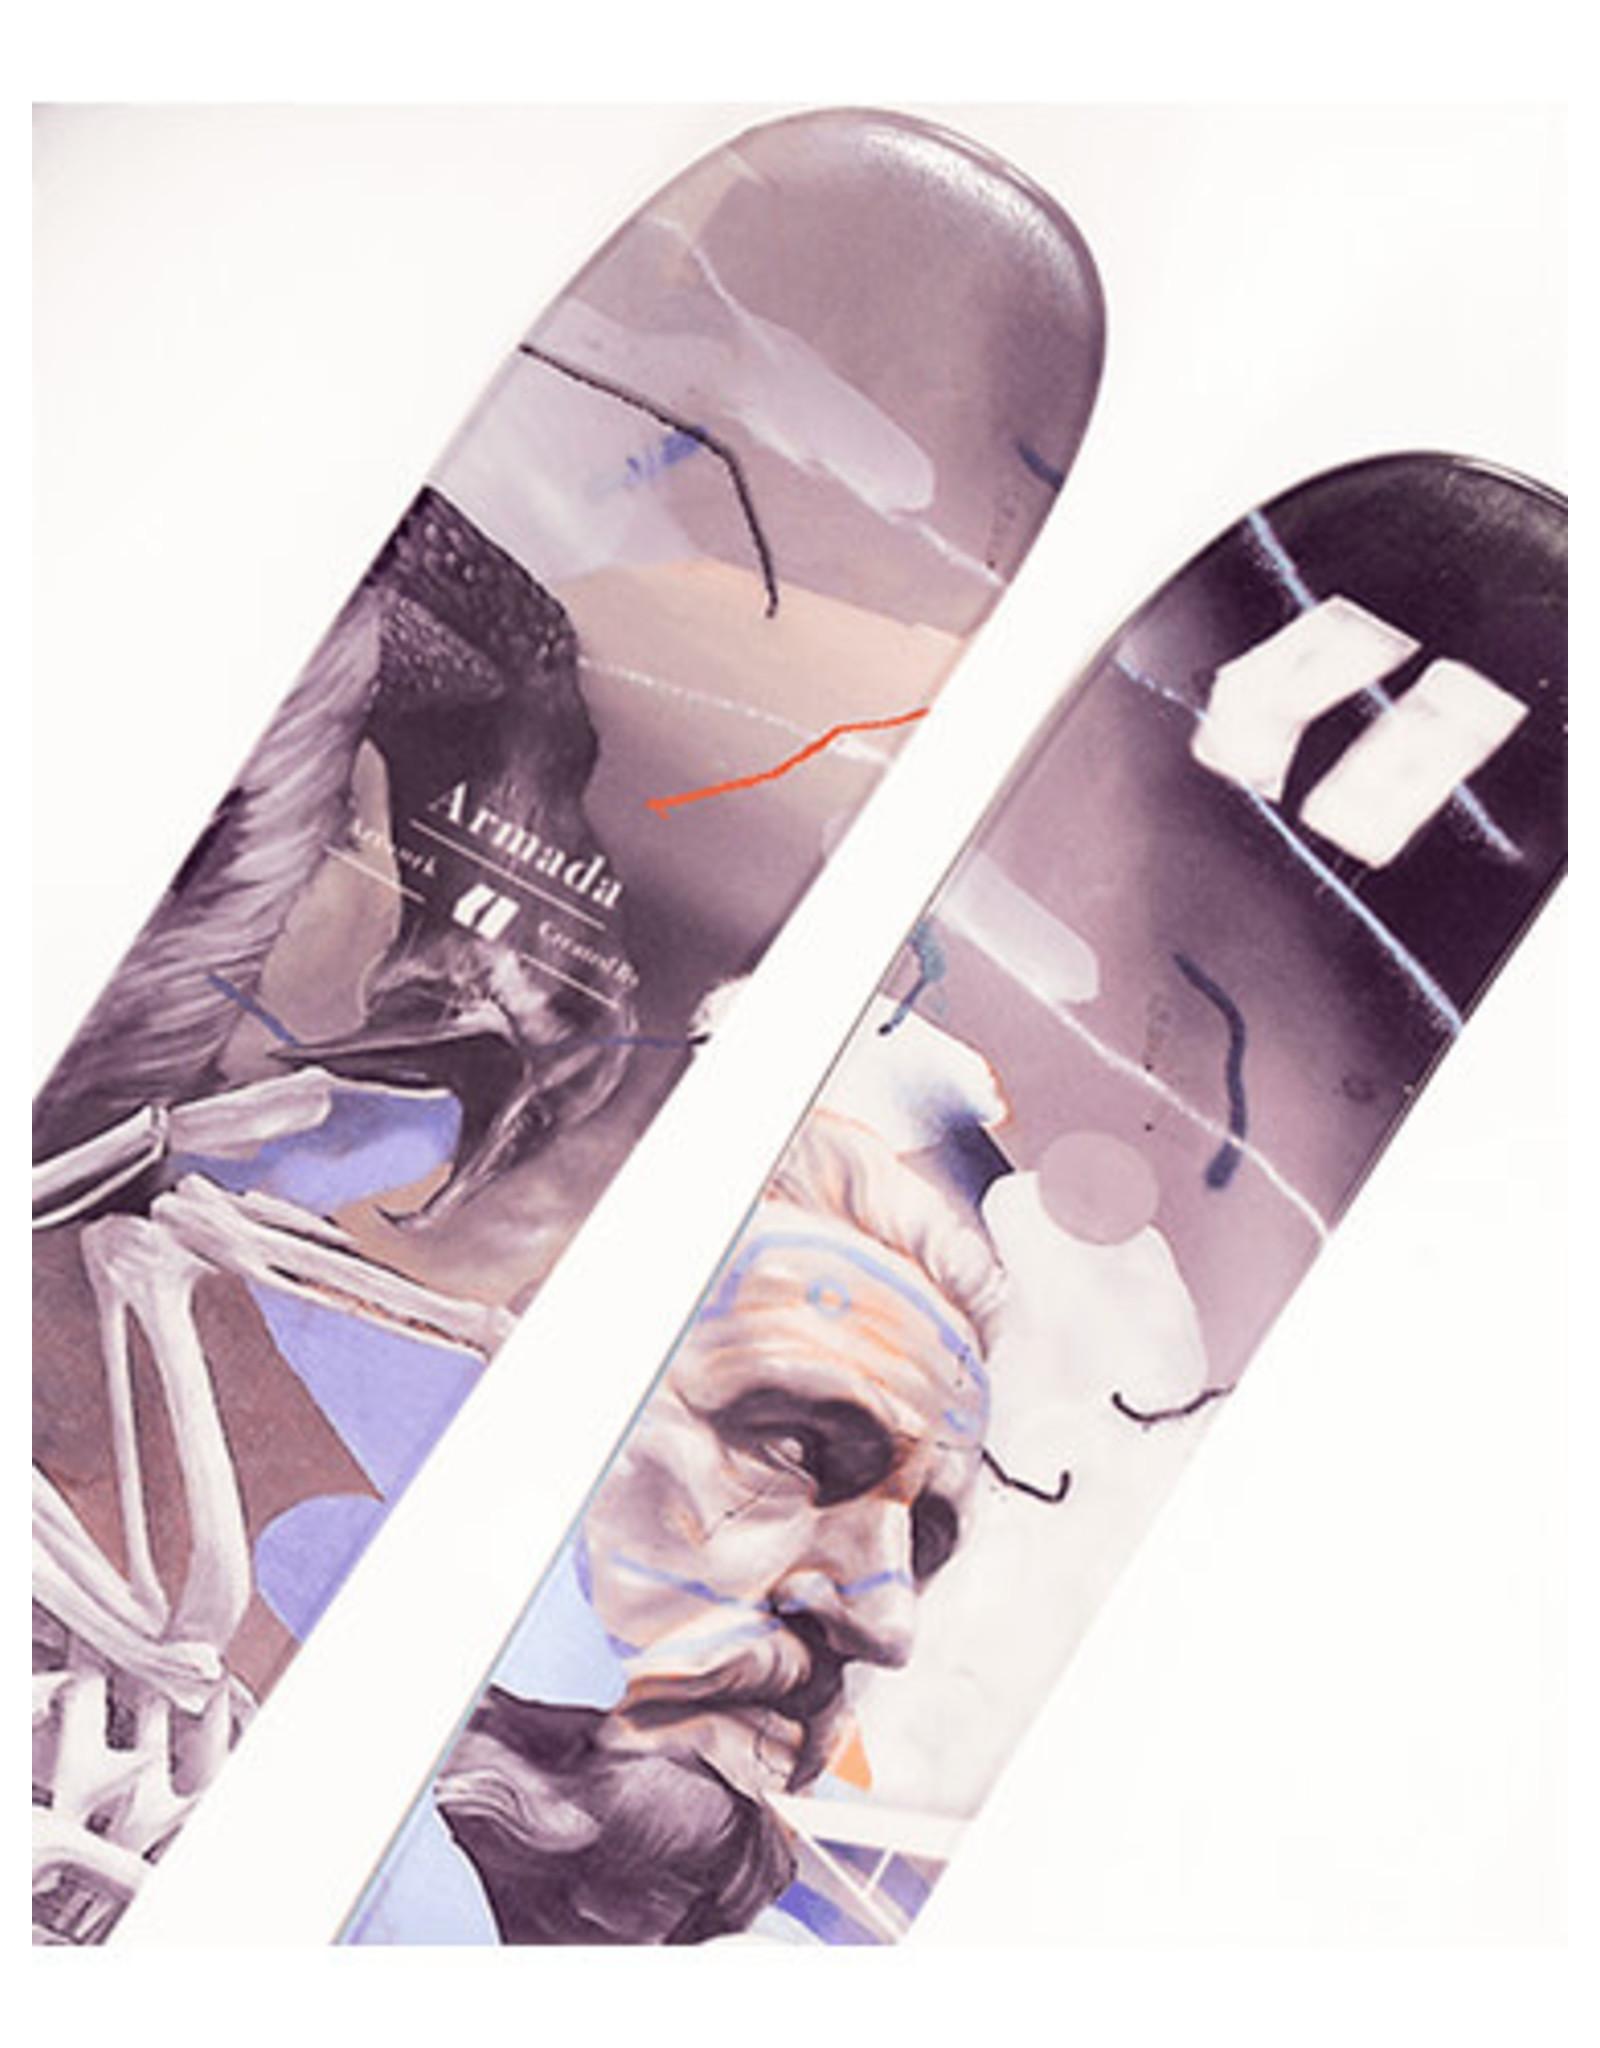 Armada Armada ARV 86 Skis 2021